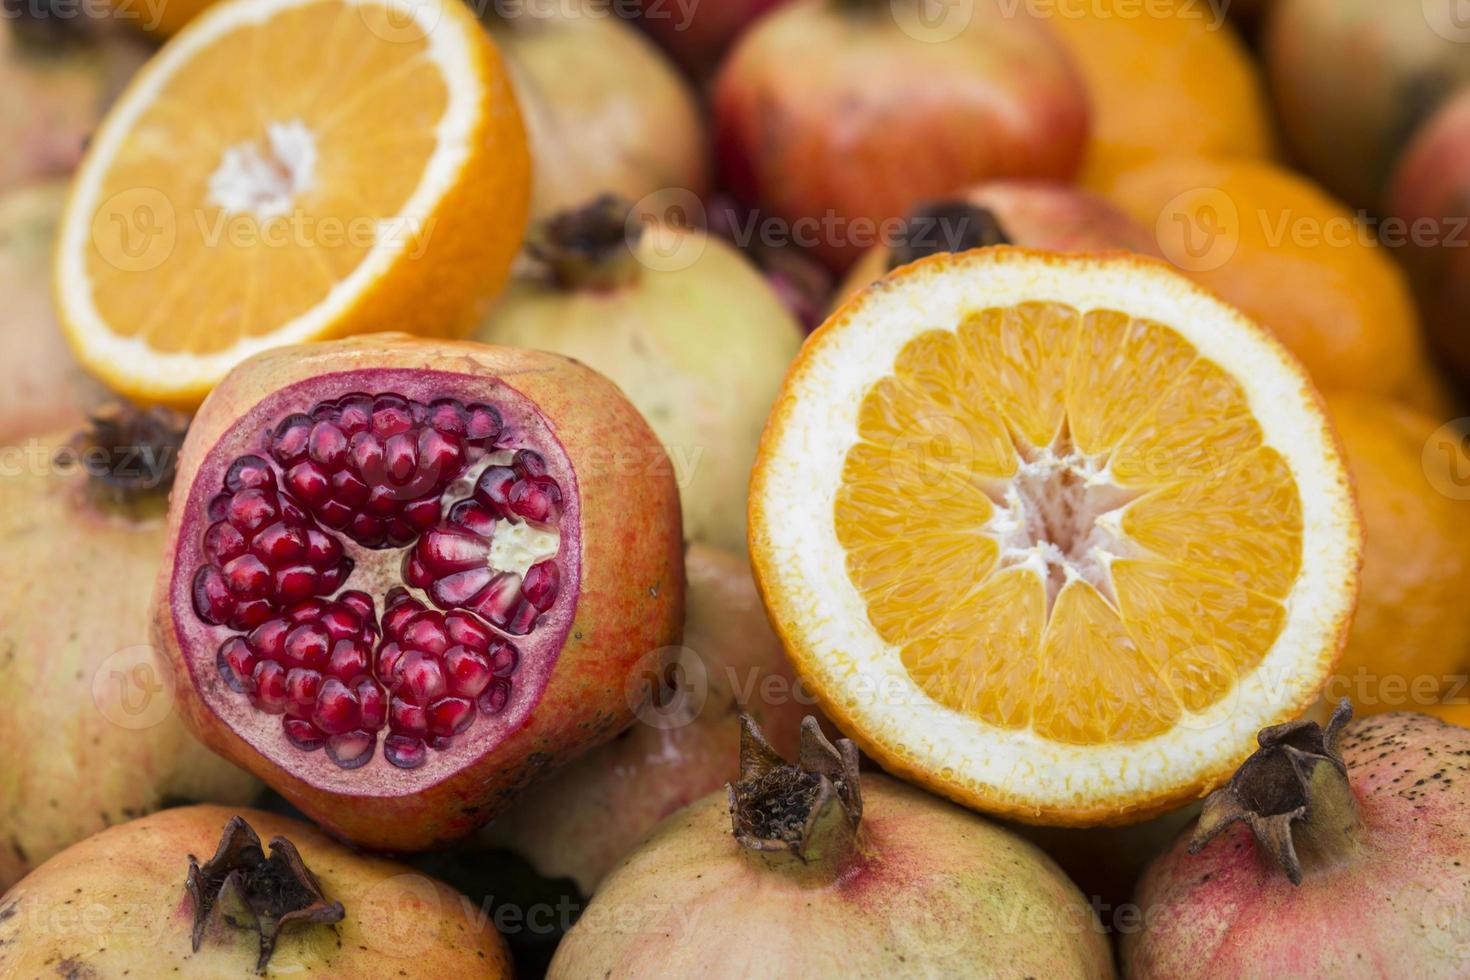 Pomegranate & Orange photo